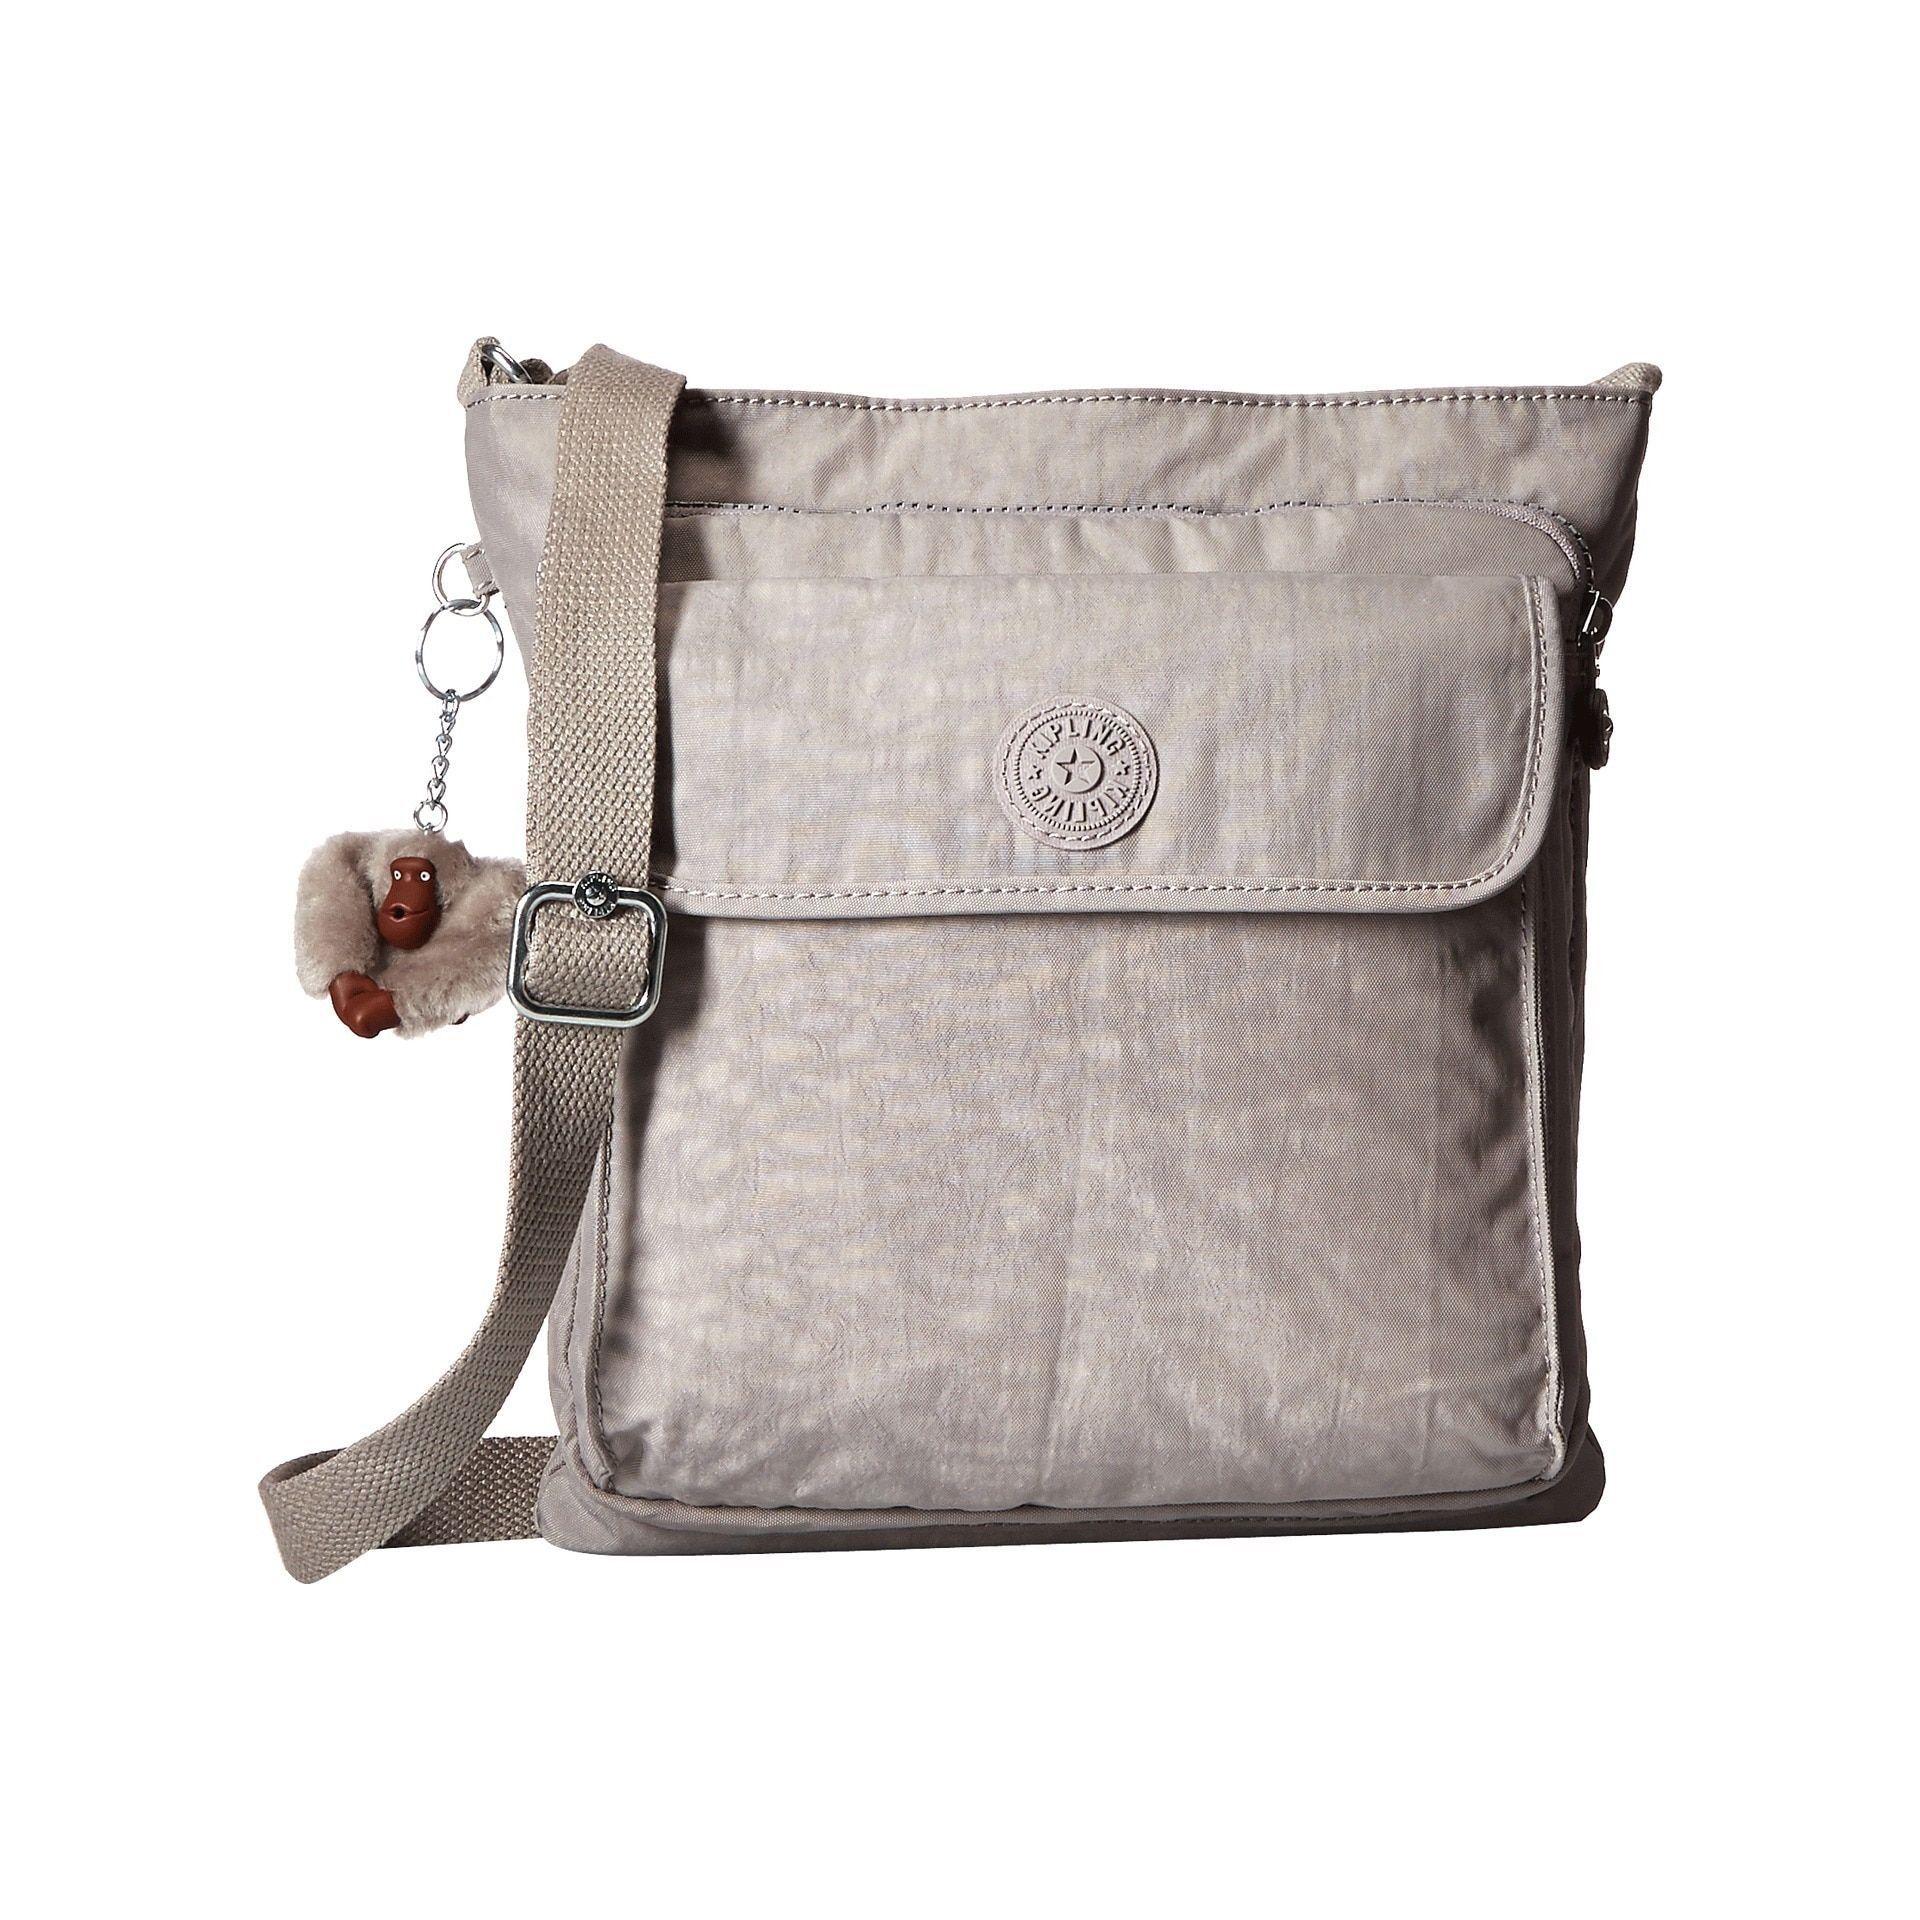 Kipling Machida Slate Crossbody Handbag